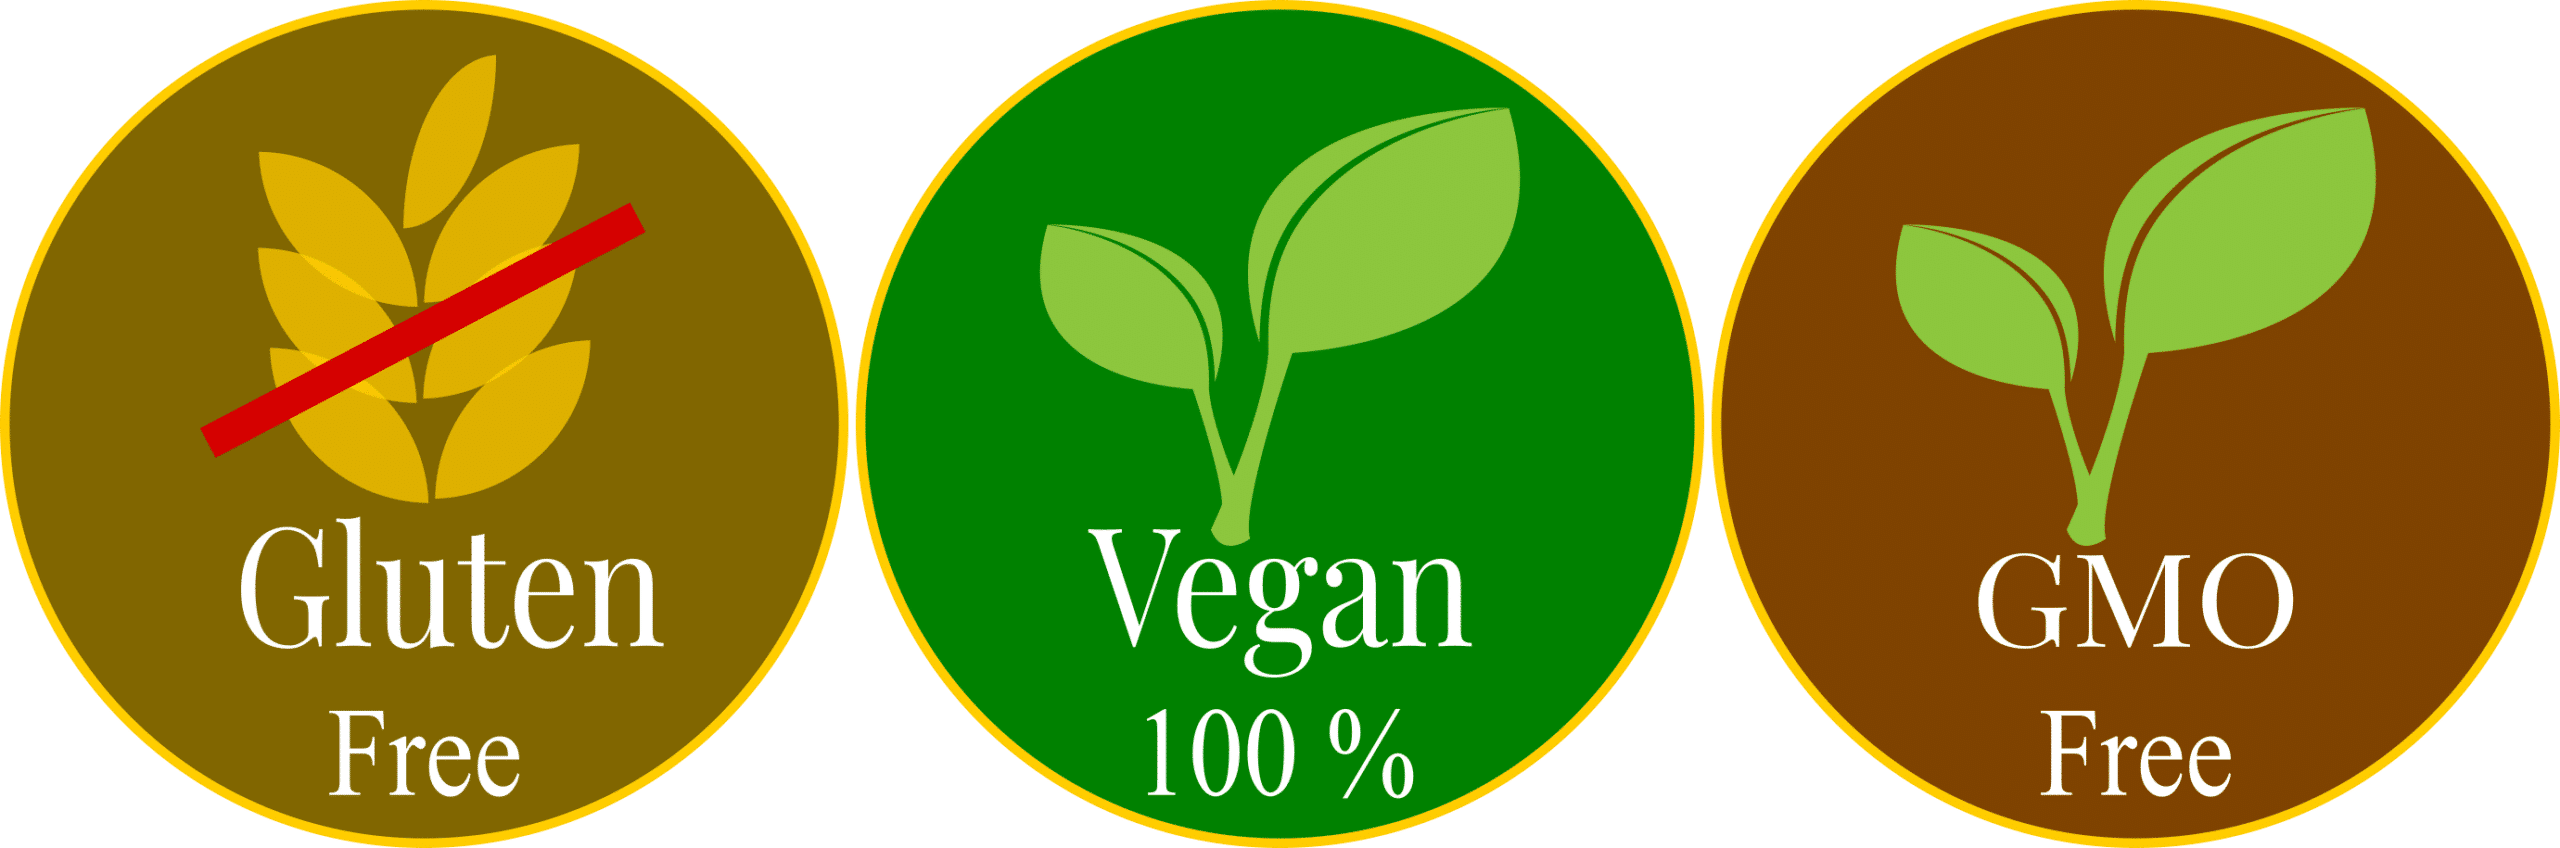 gluten_free_vegan_non_gmo